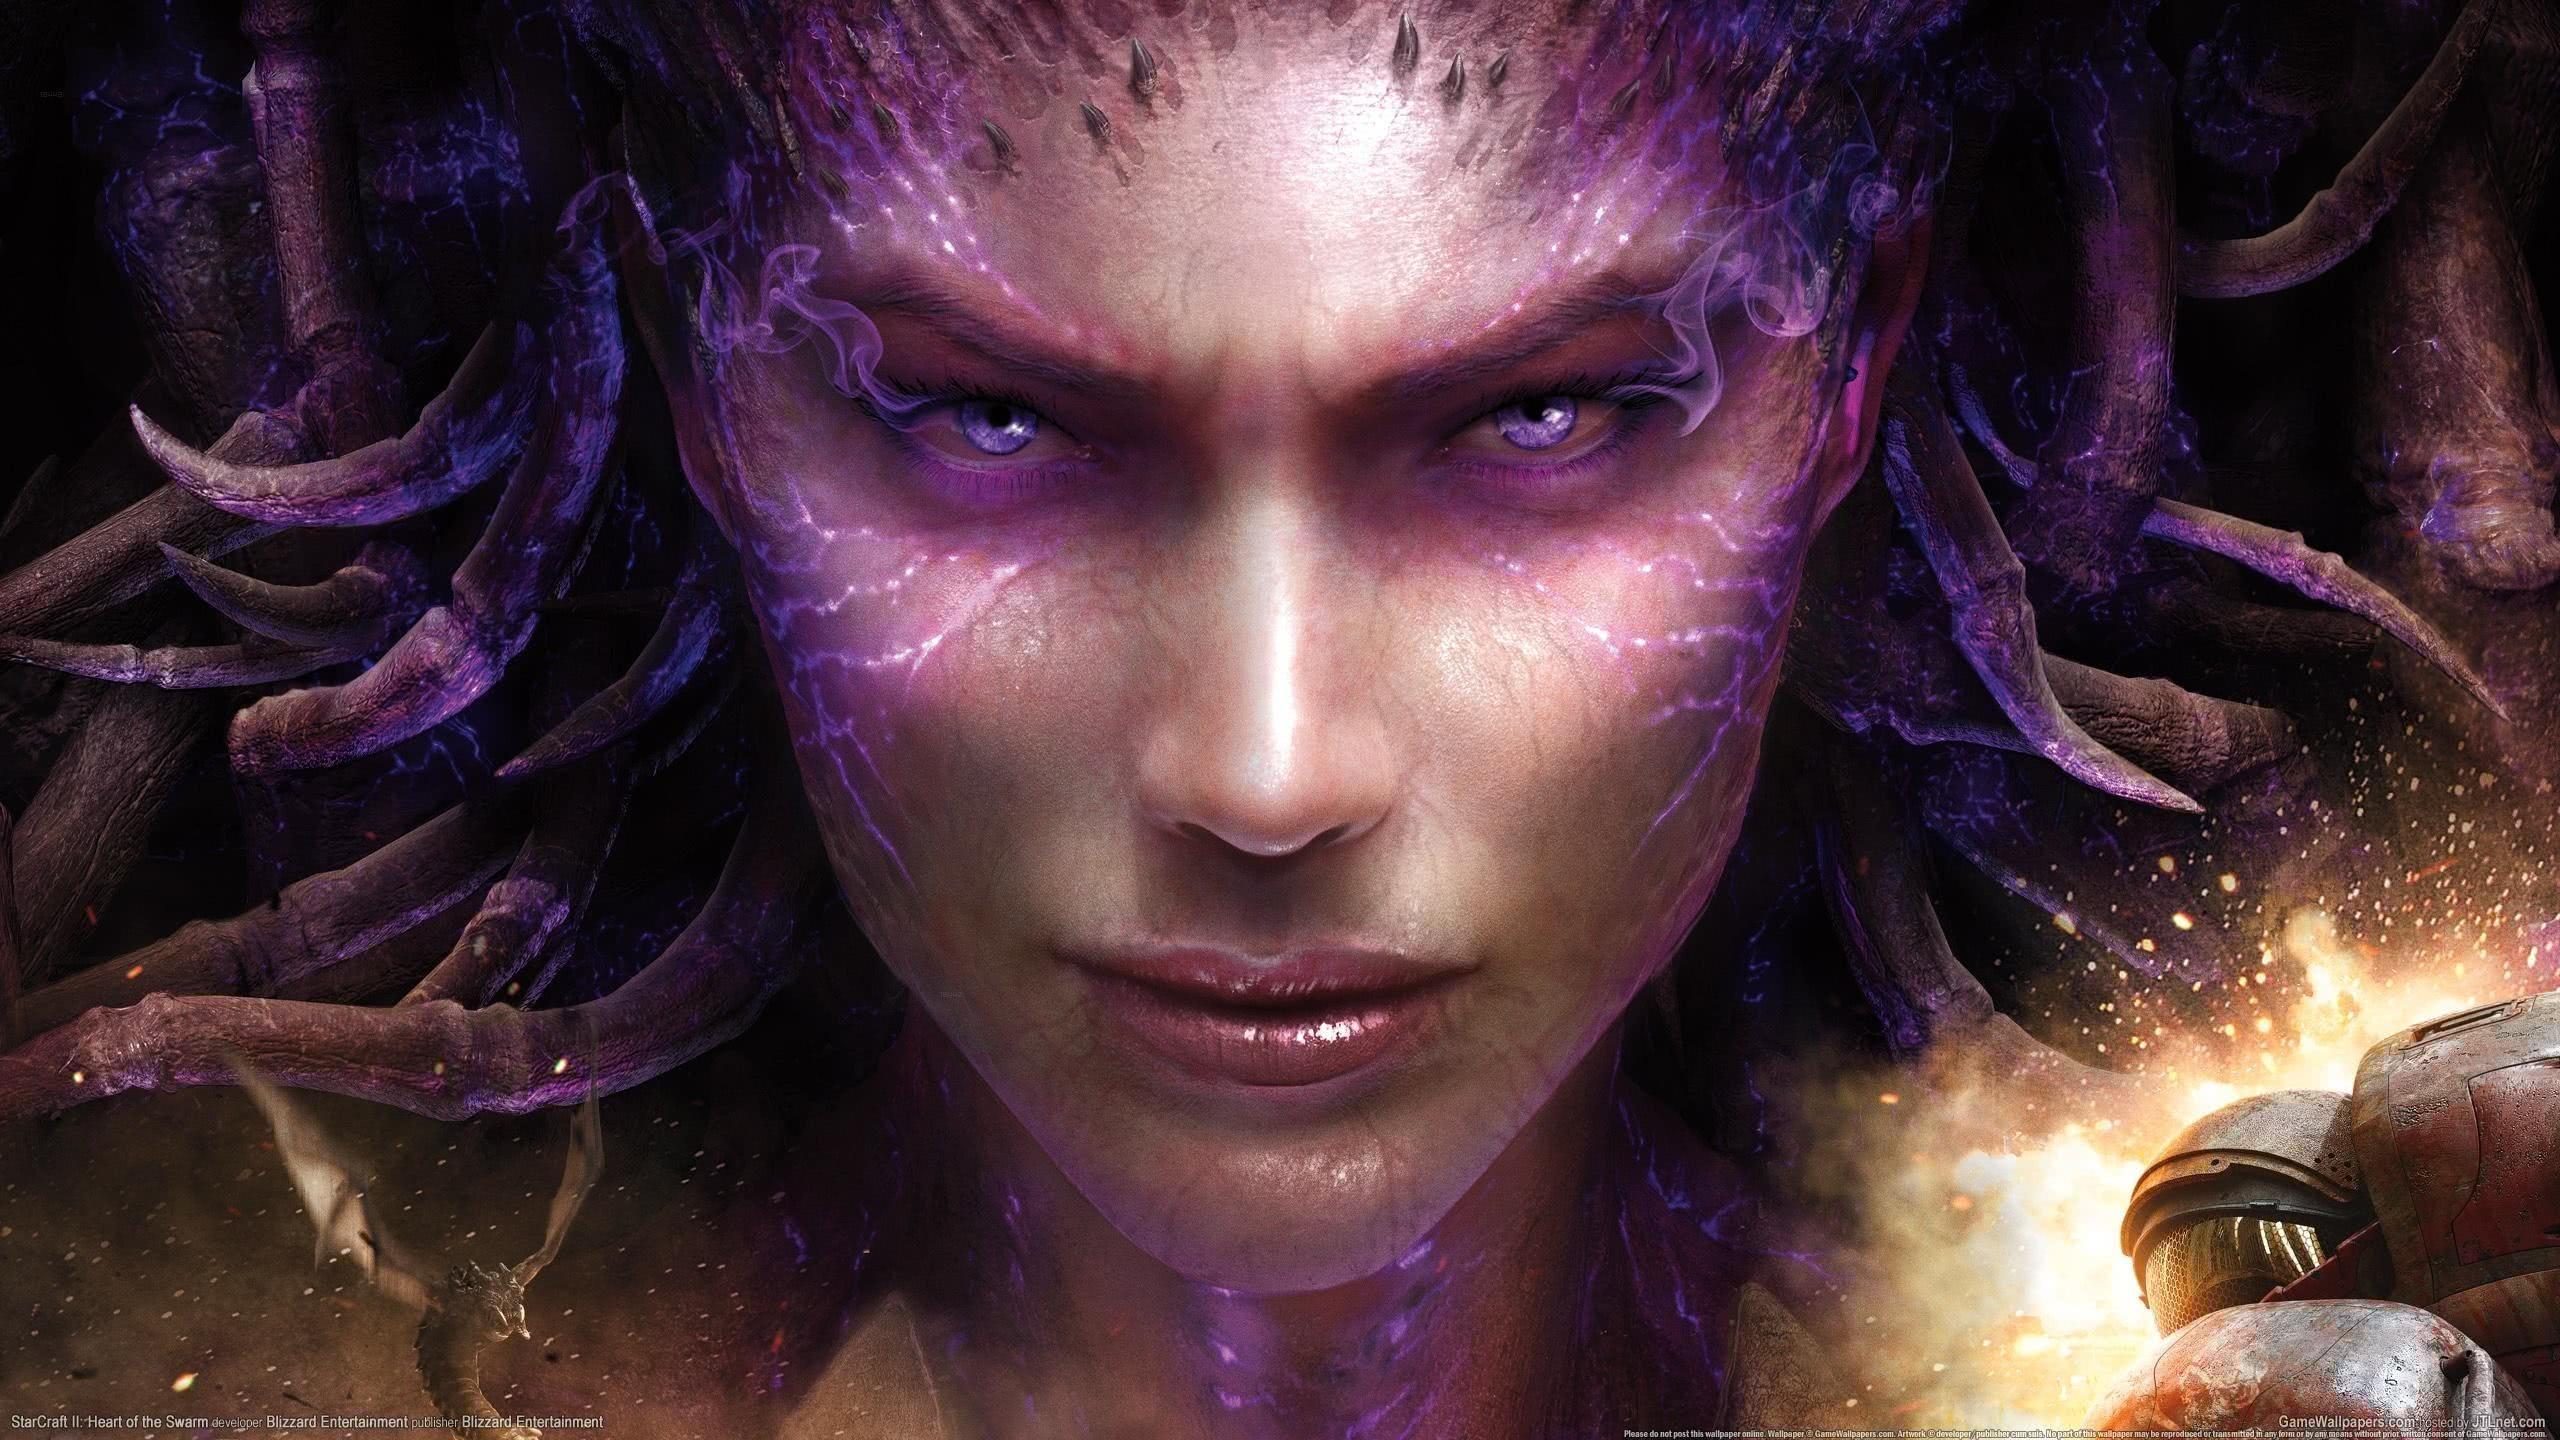 Starcraft ii heart of the swarm sarah kerrigan wqhd 1440p - Sarah kerrigan wallpaper ...